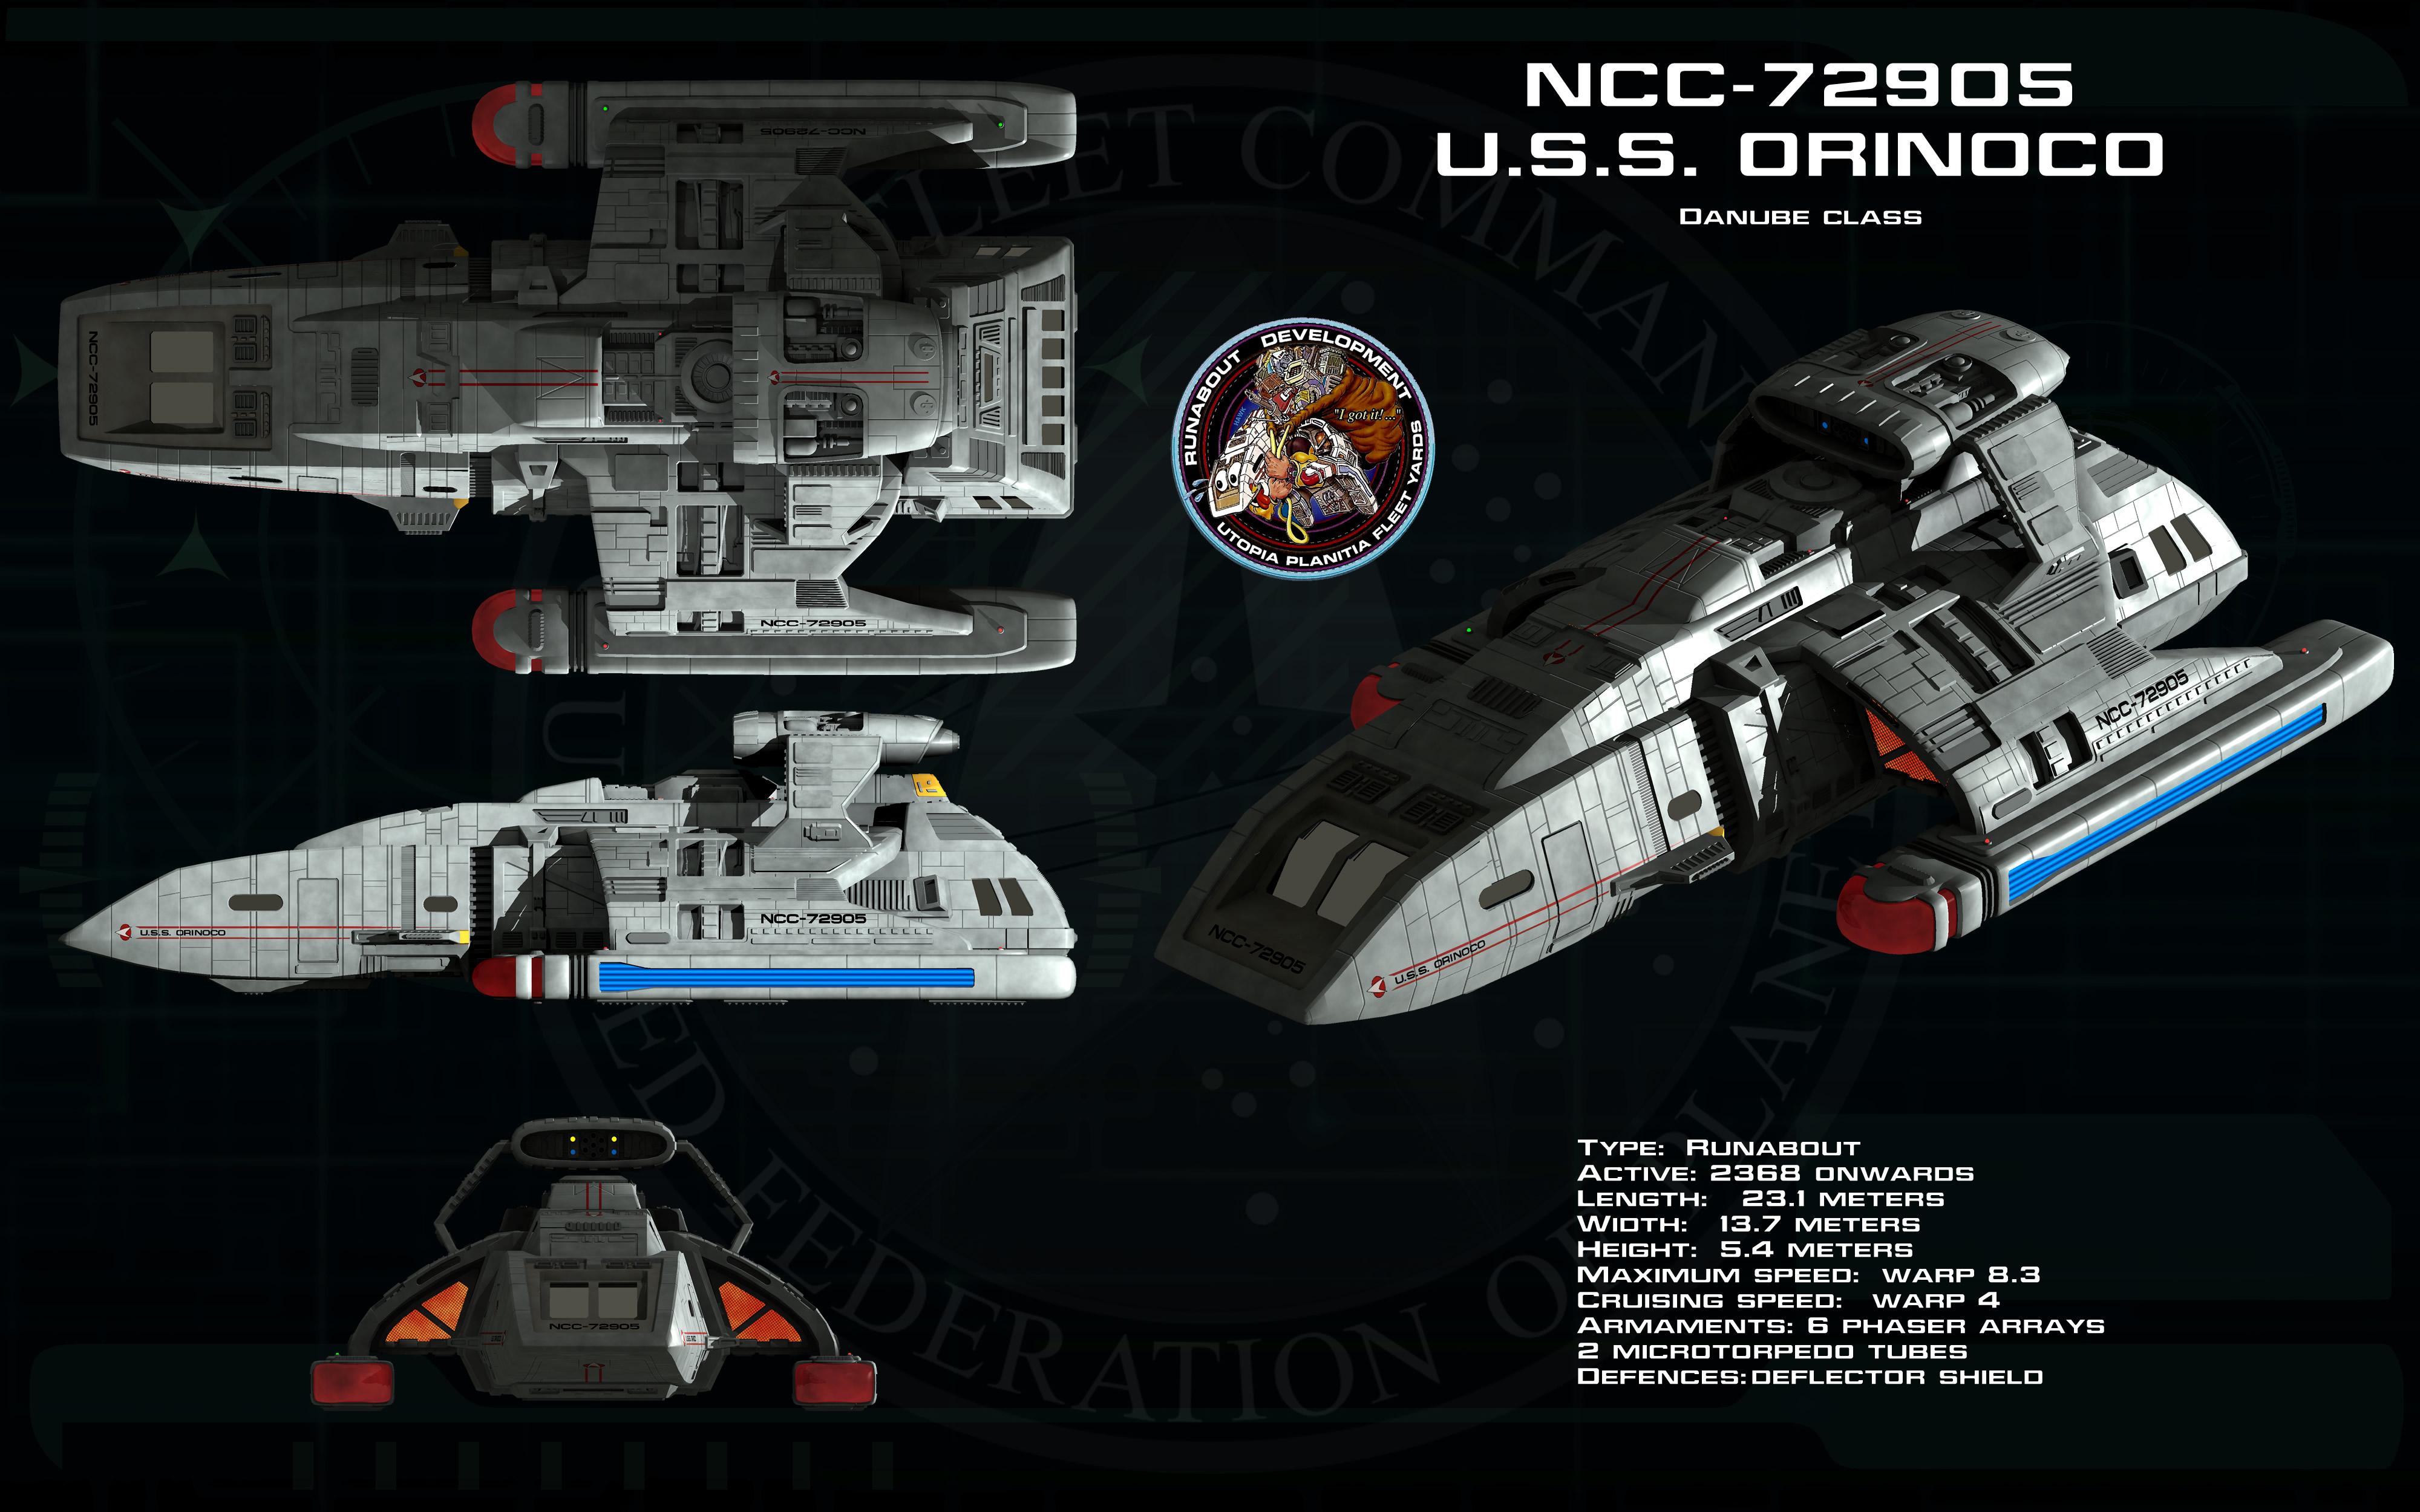 Danube Class Ortho Updated 449160604 on Star Trek Deep Space Nine Blueprints